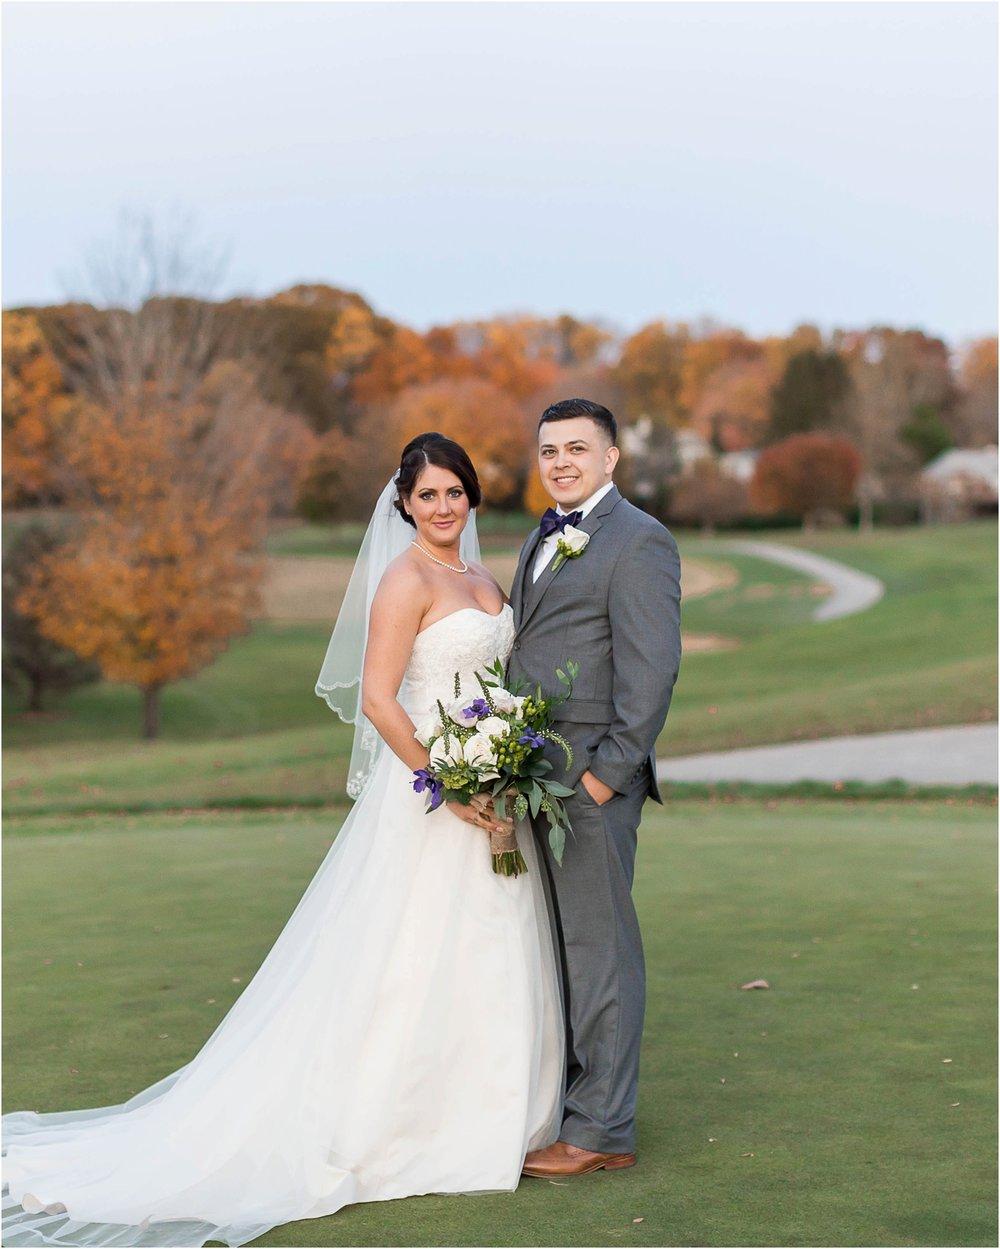 Hobbits-Glen-Golf-Course-Wedding-894.jpg